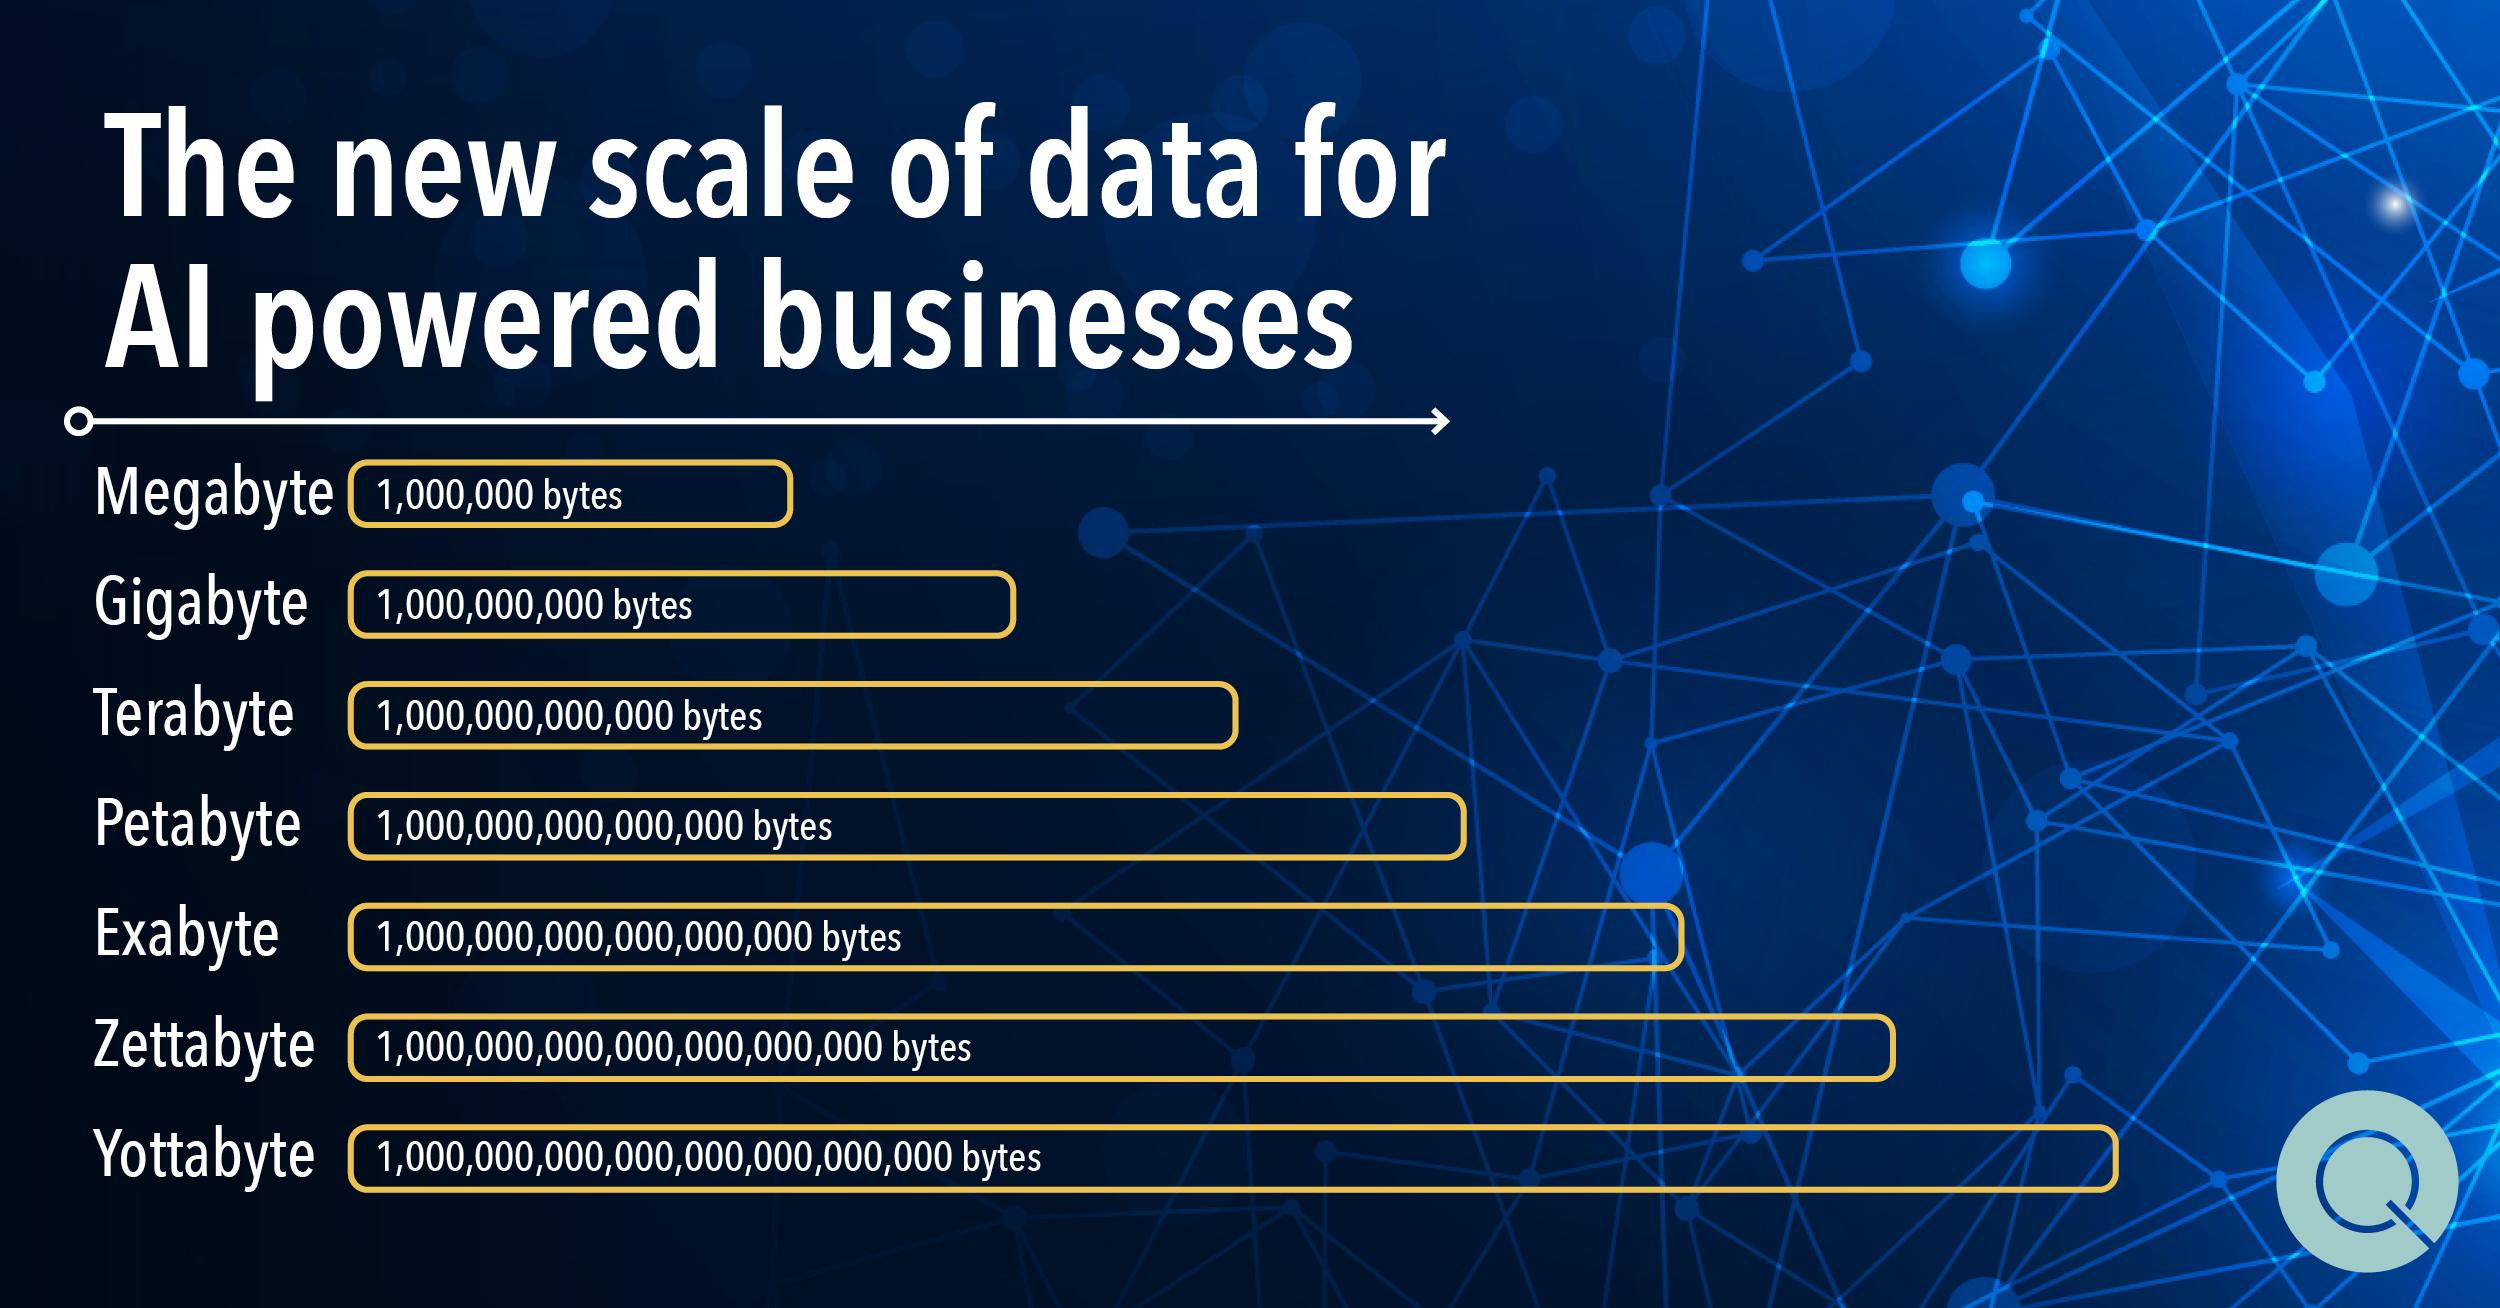 Quanton - The new scale for data